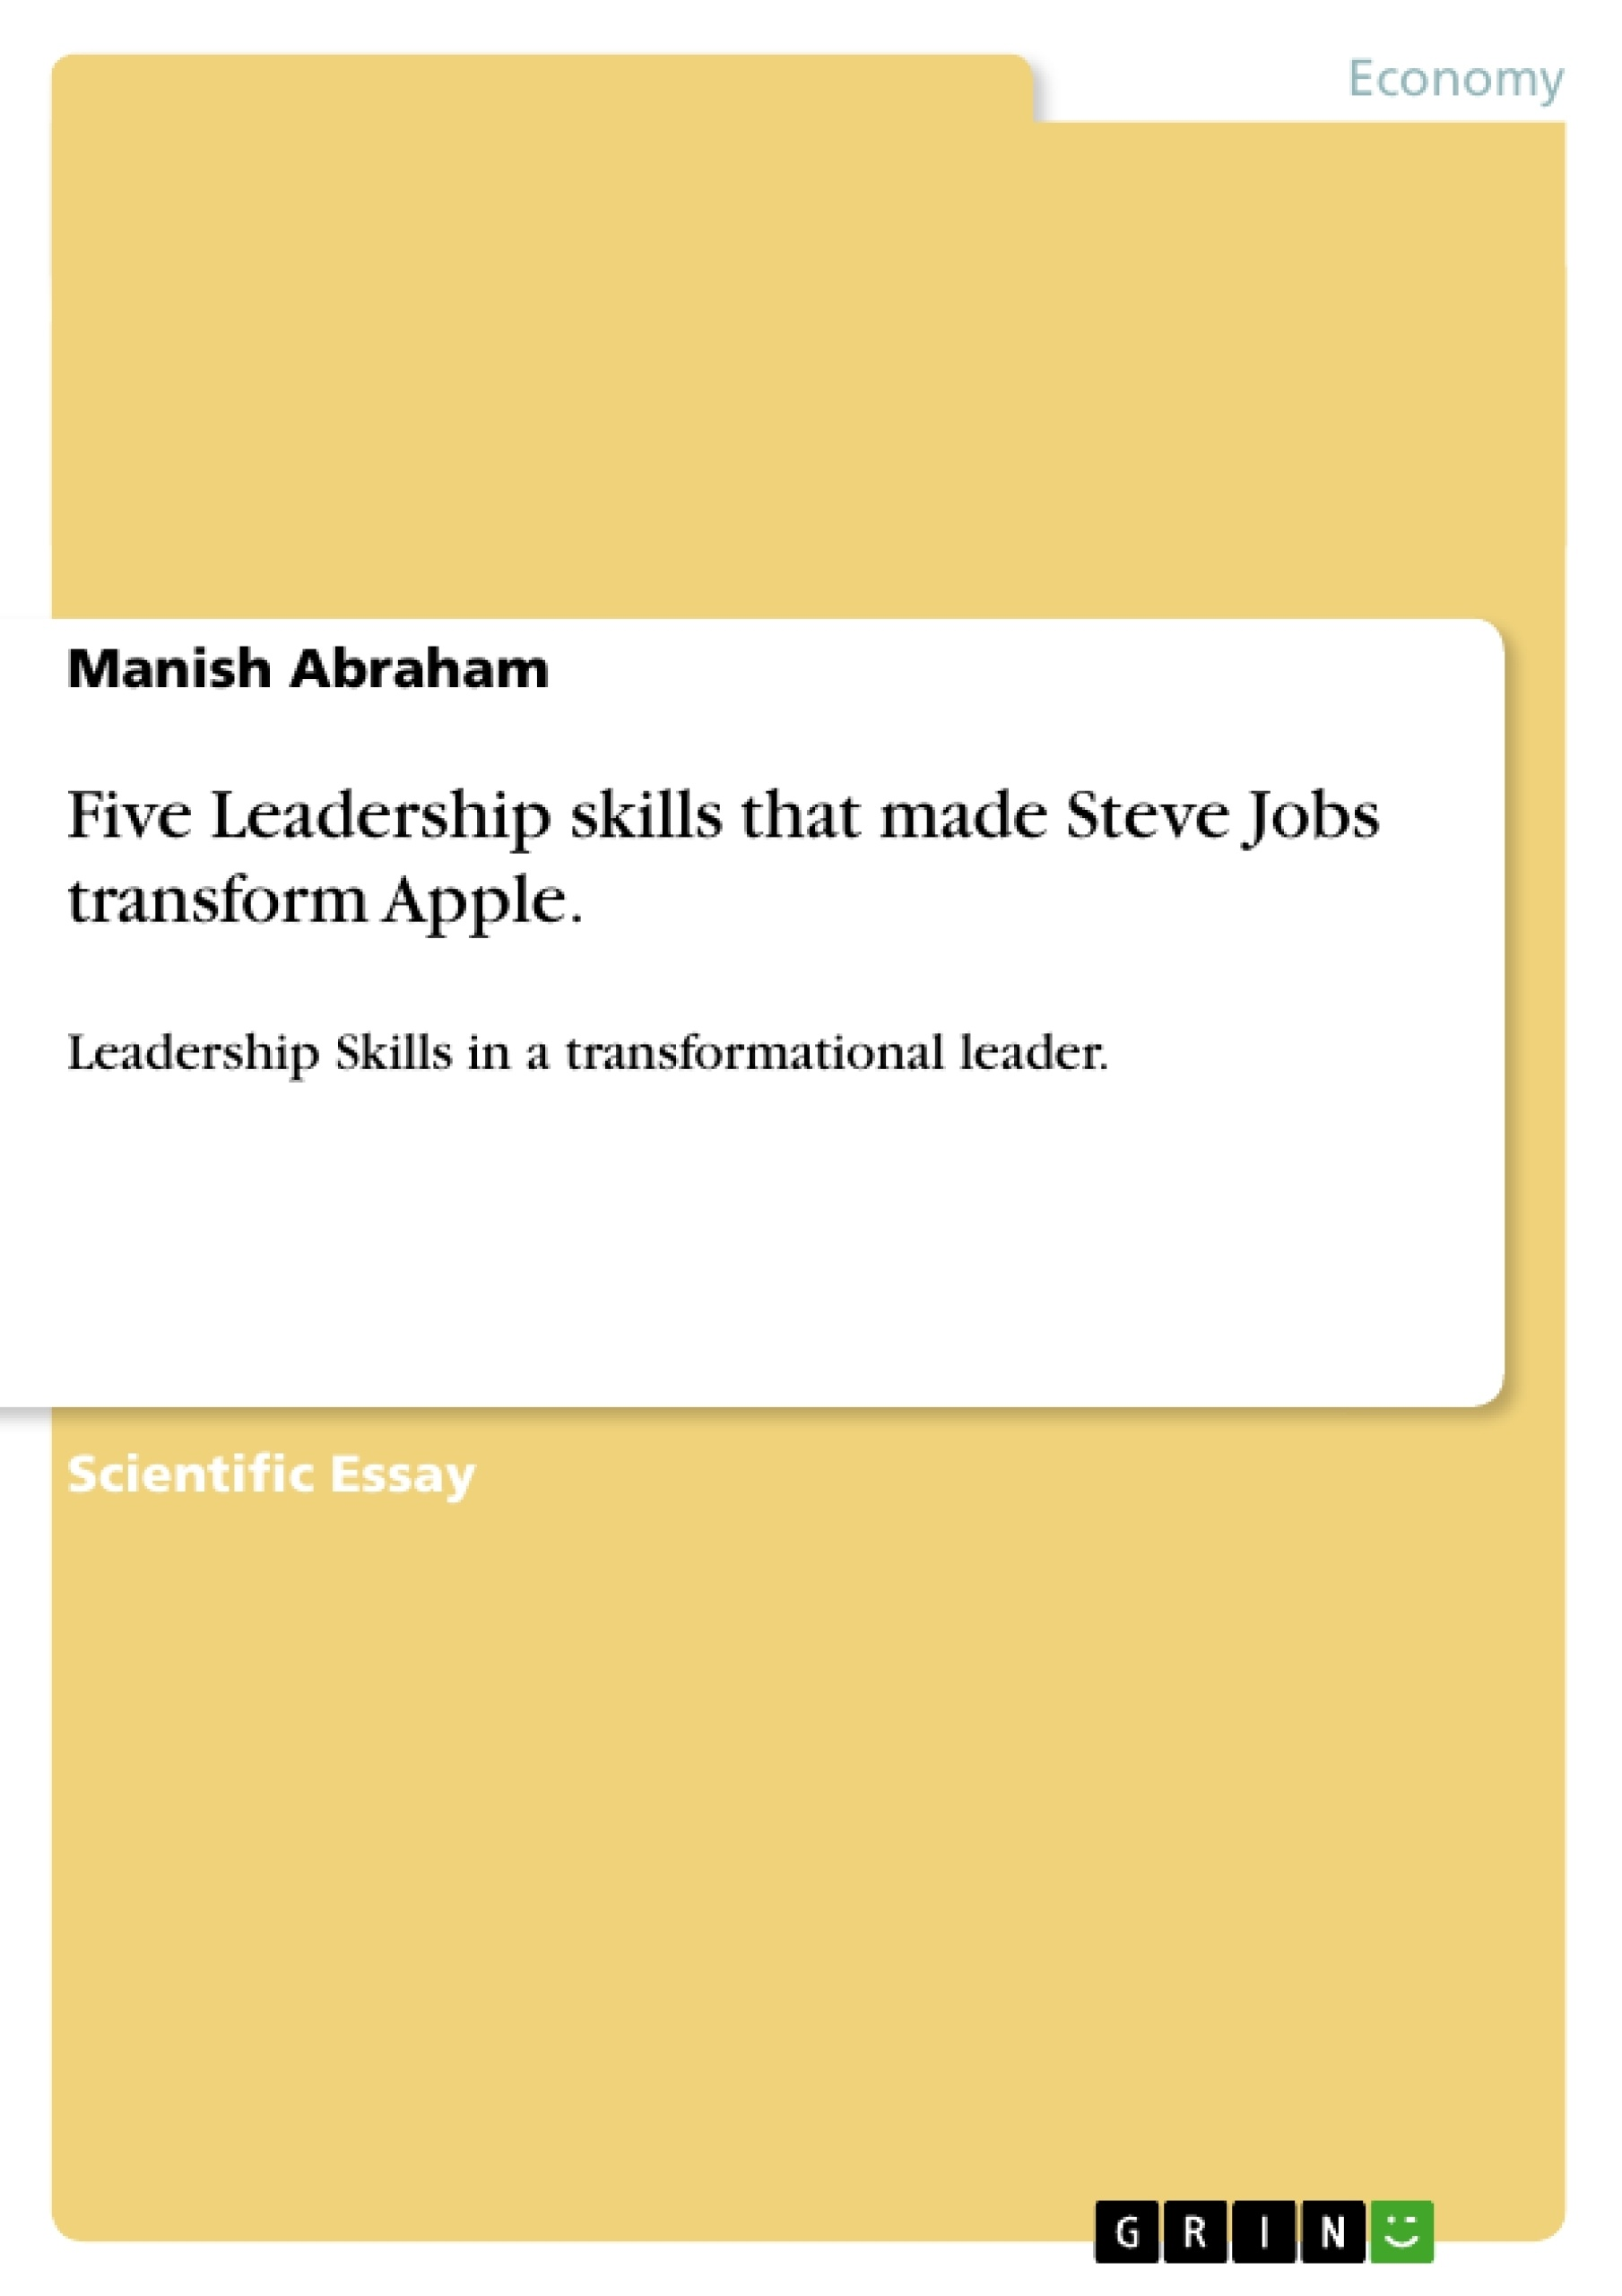 Title: Five Leadership skills that made Steve Jobs transform Apple.